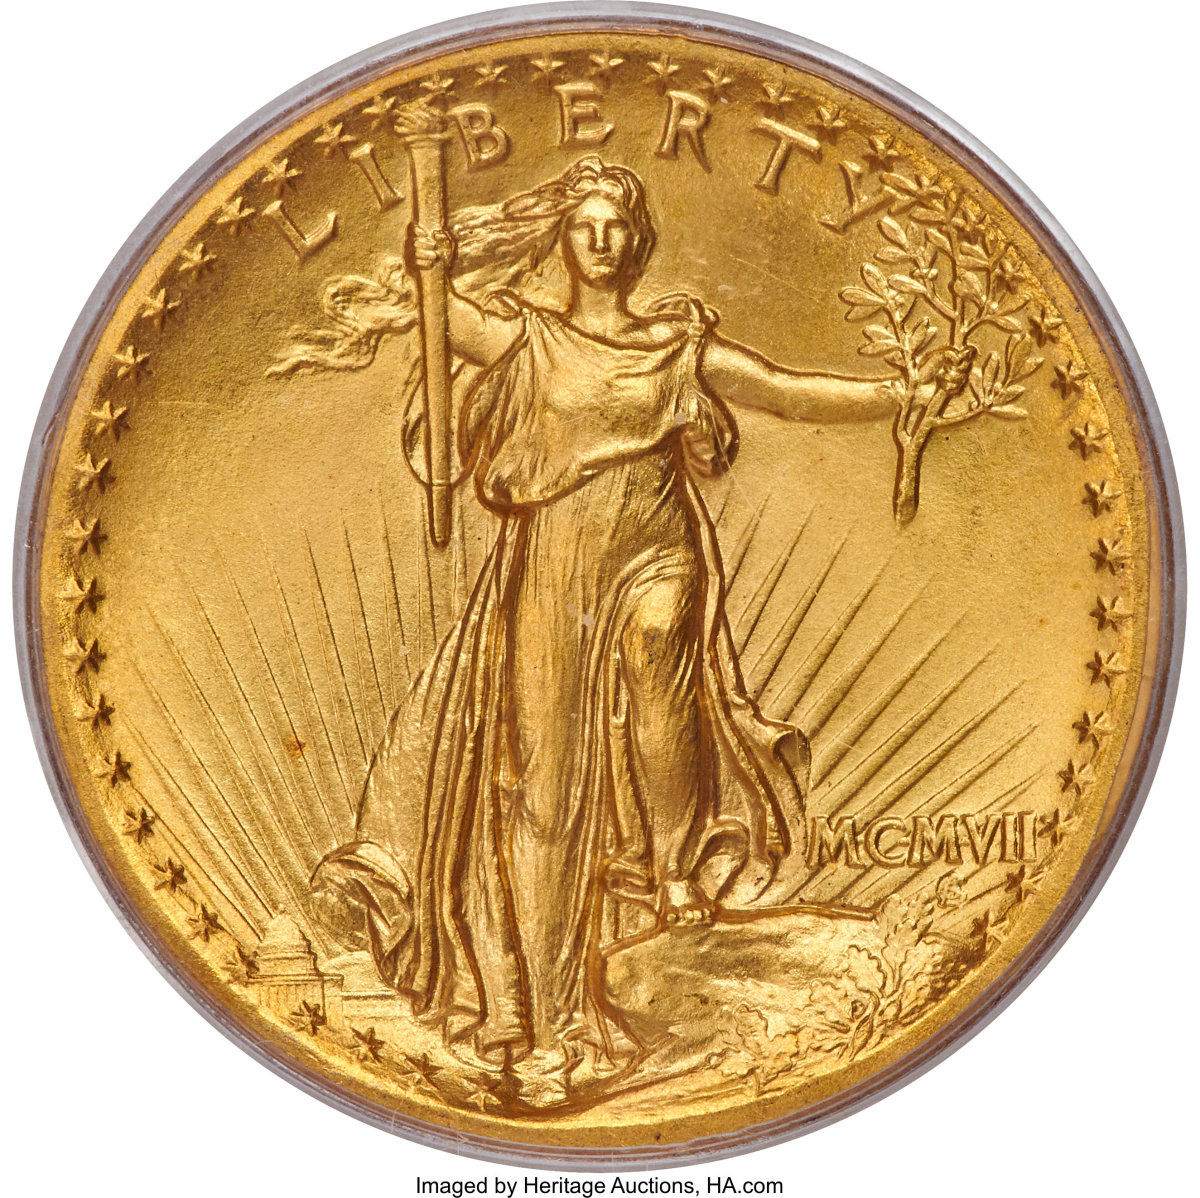 1907 Gaudens Double Eagle